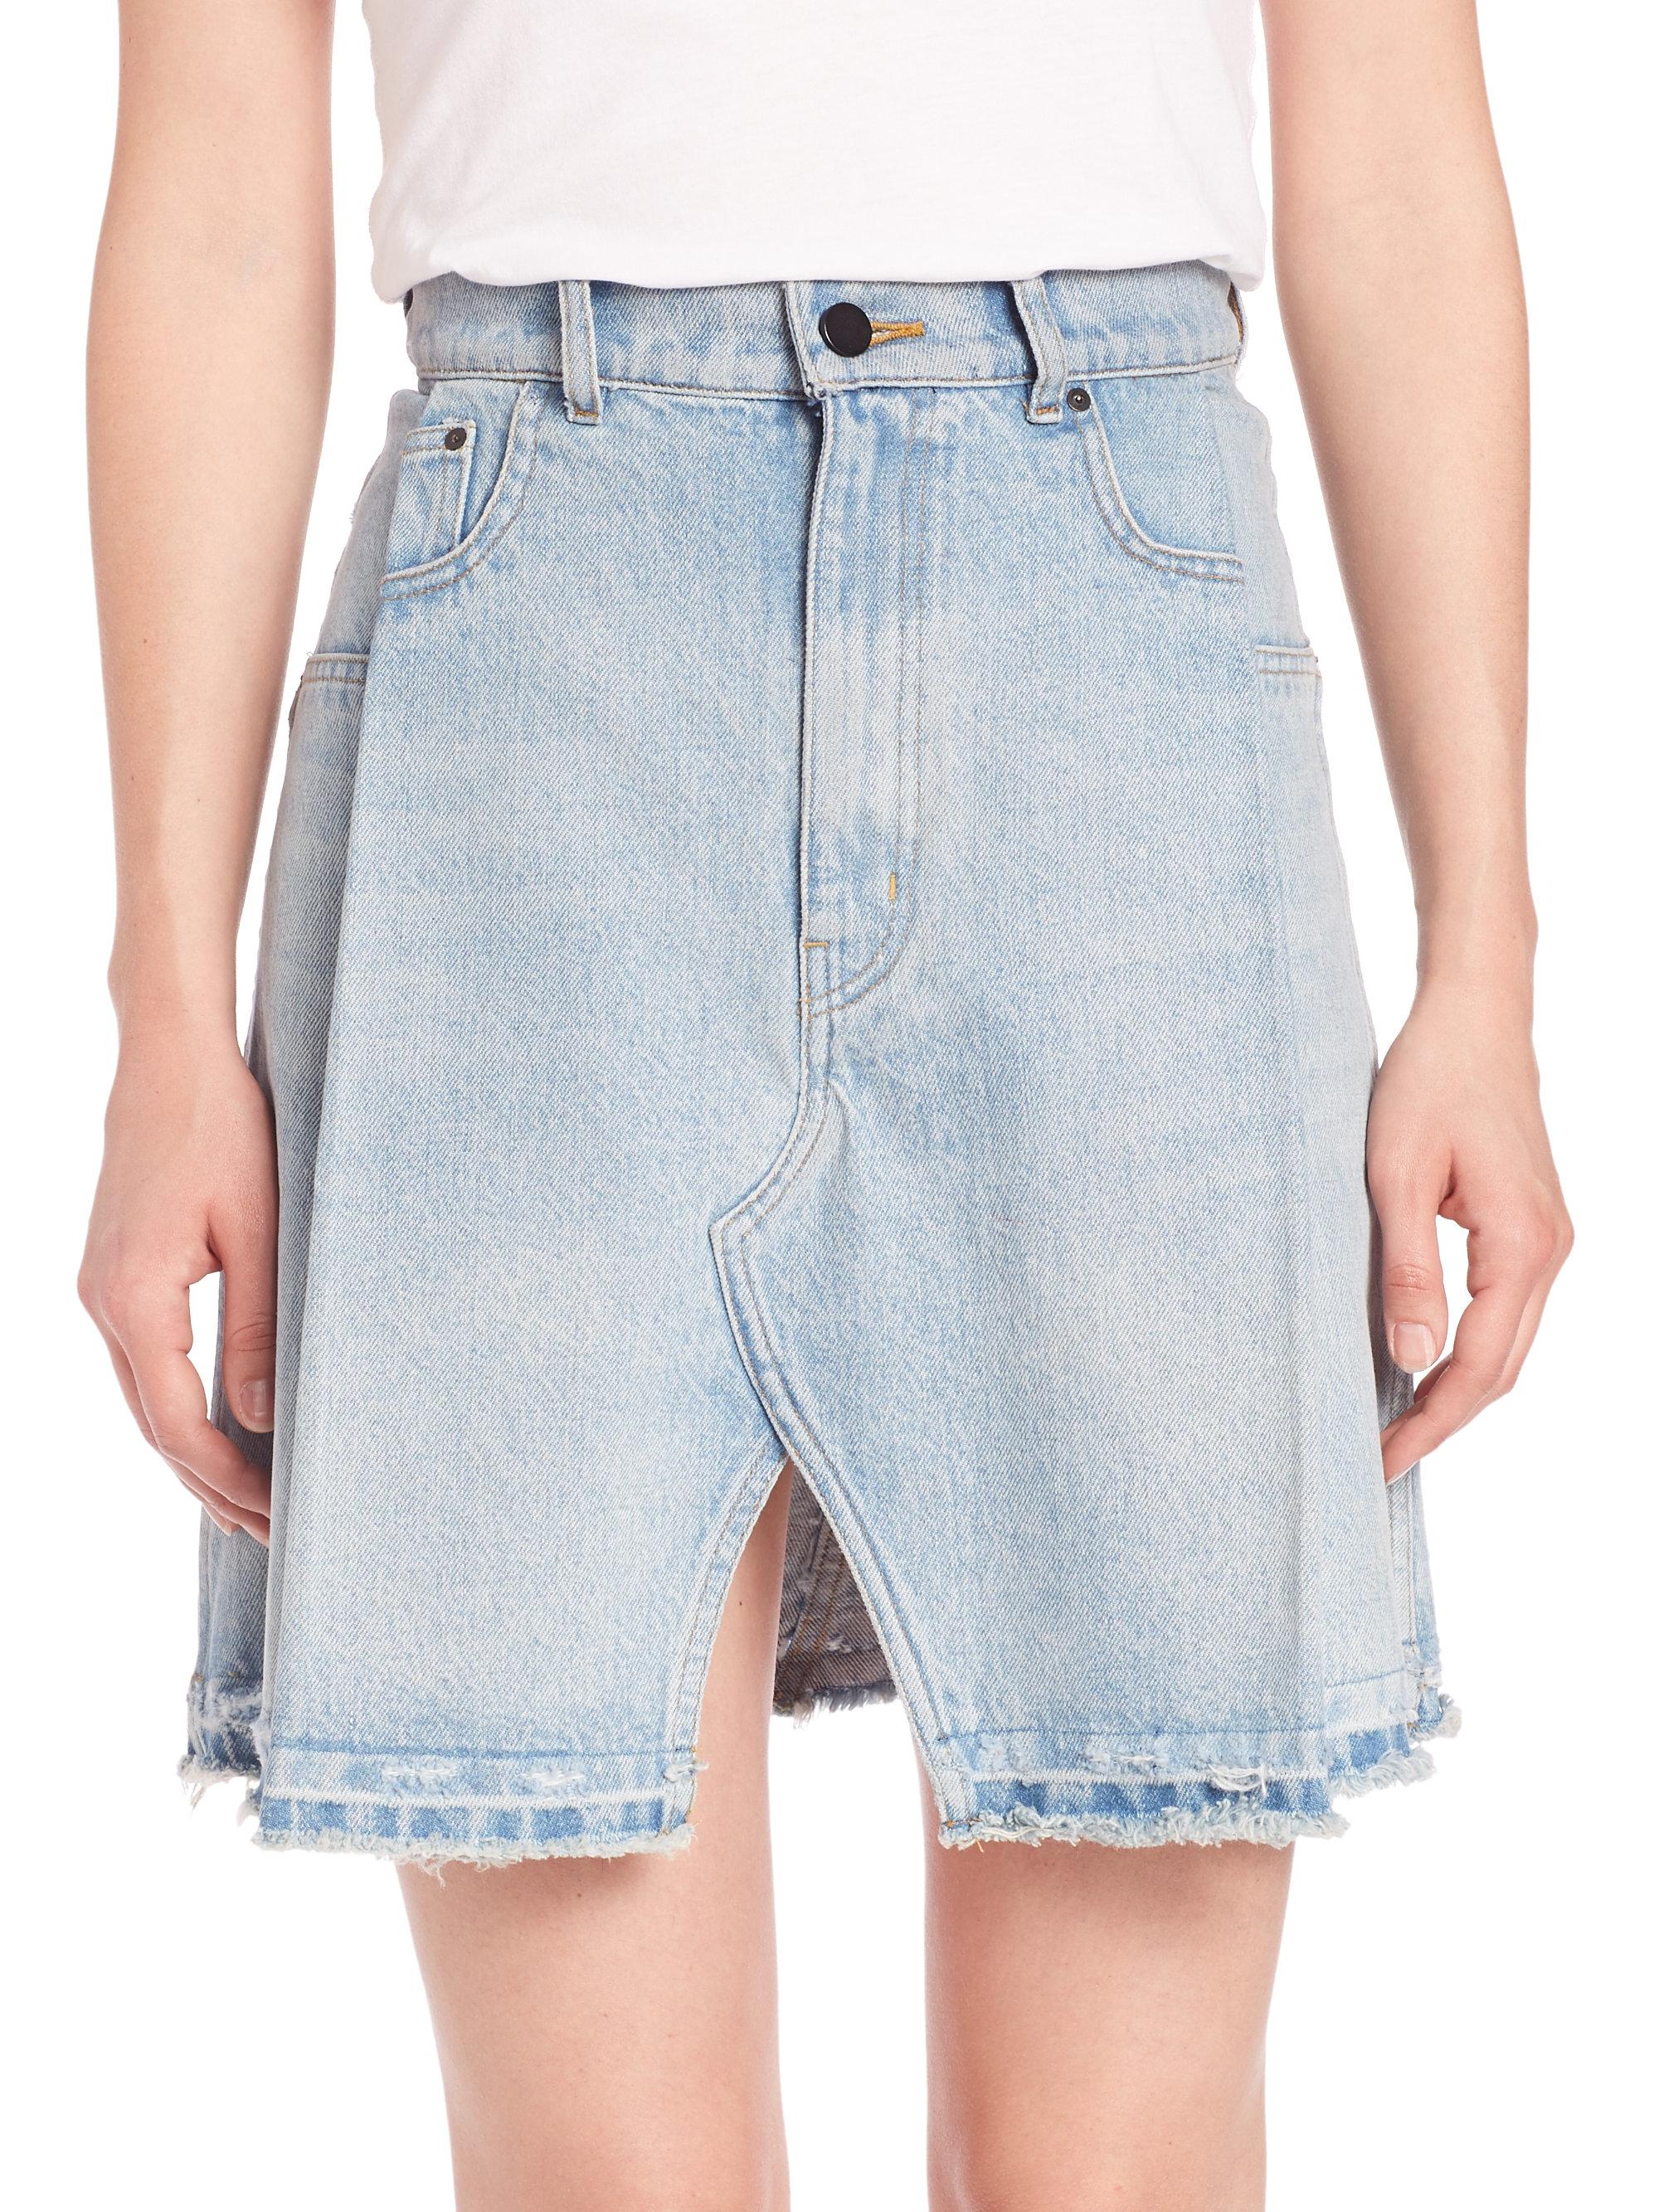 Alexander wang Pleated Bleached Denim Mini Skirt in Blue | Lyst